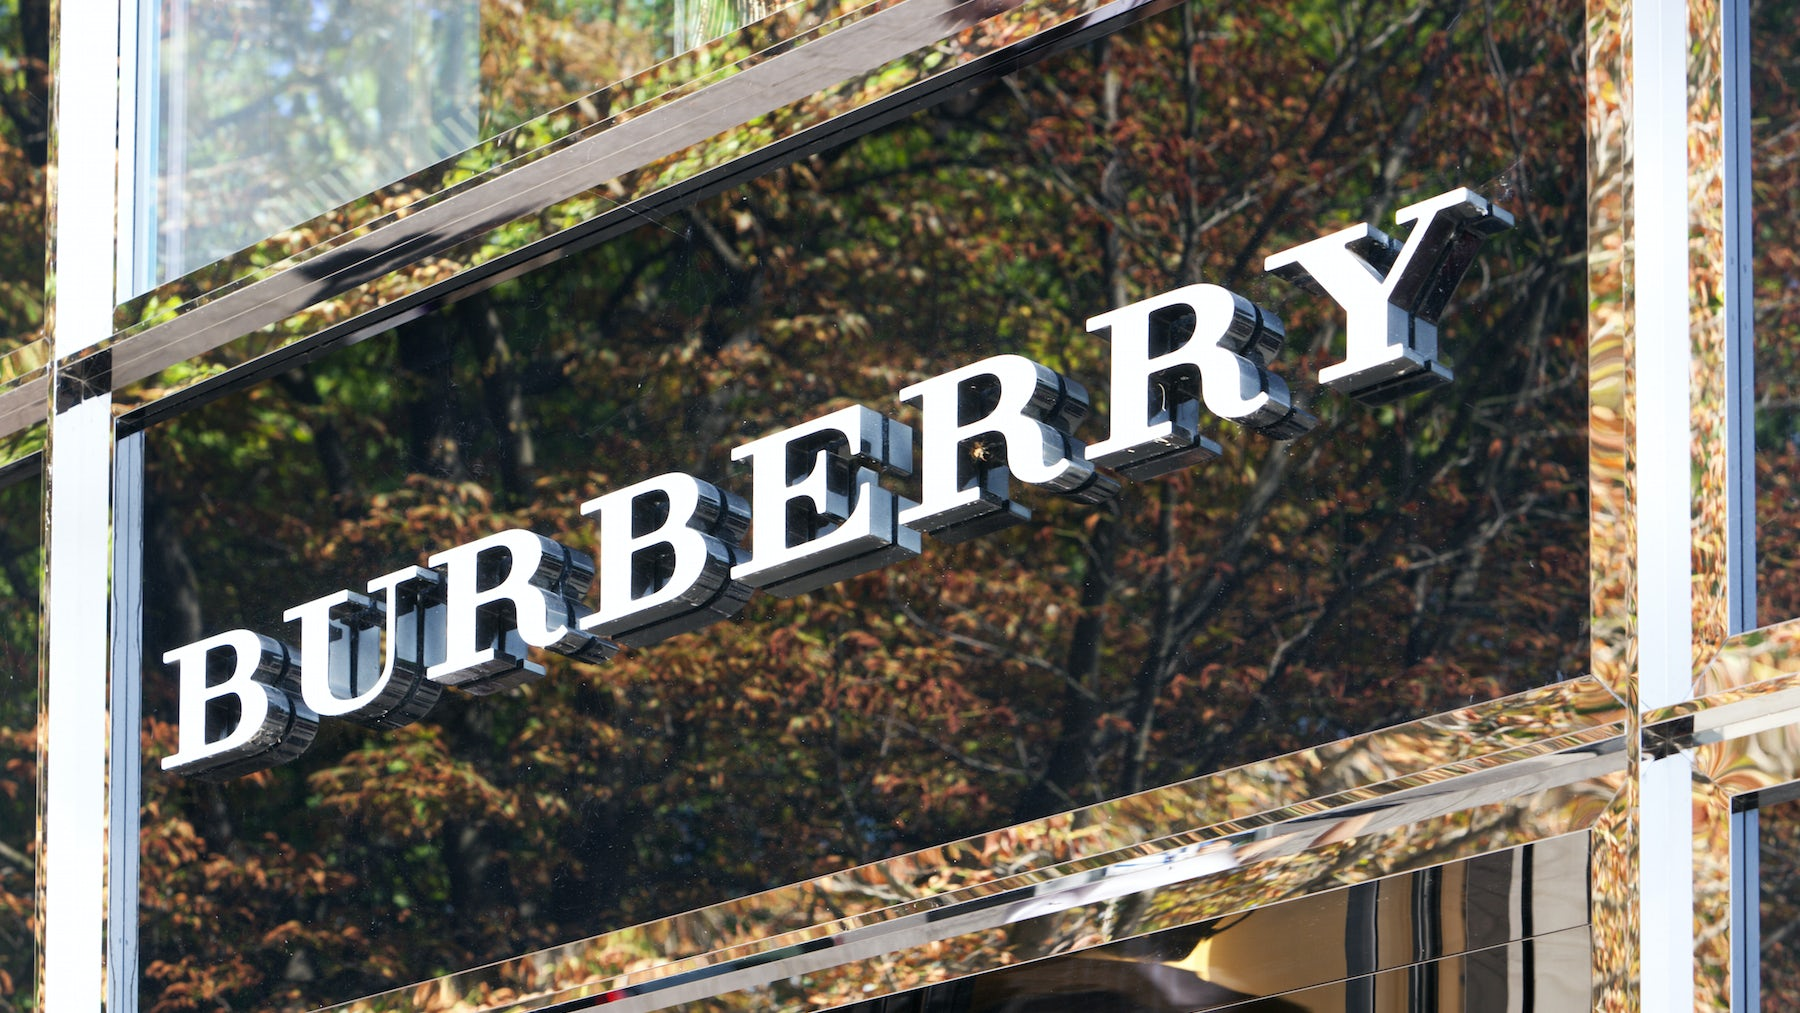 Burberry | Source: Shutterstock